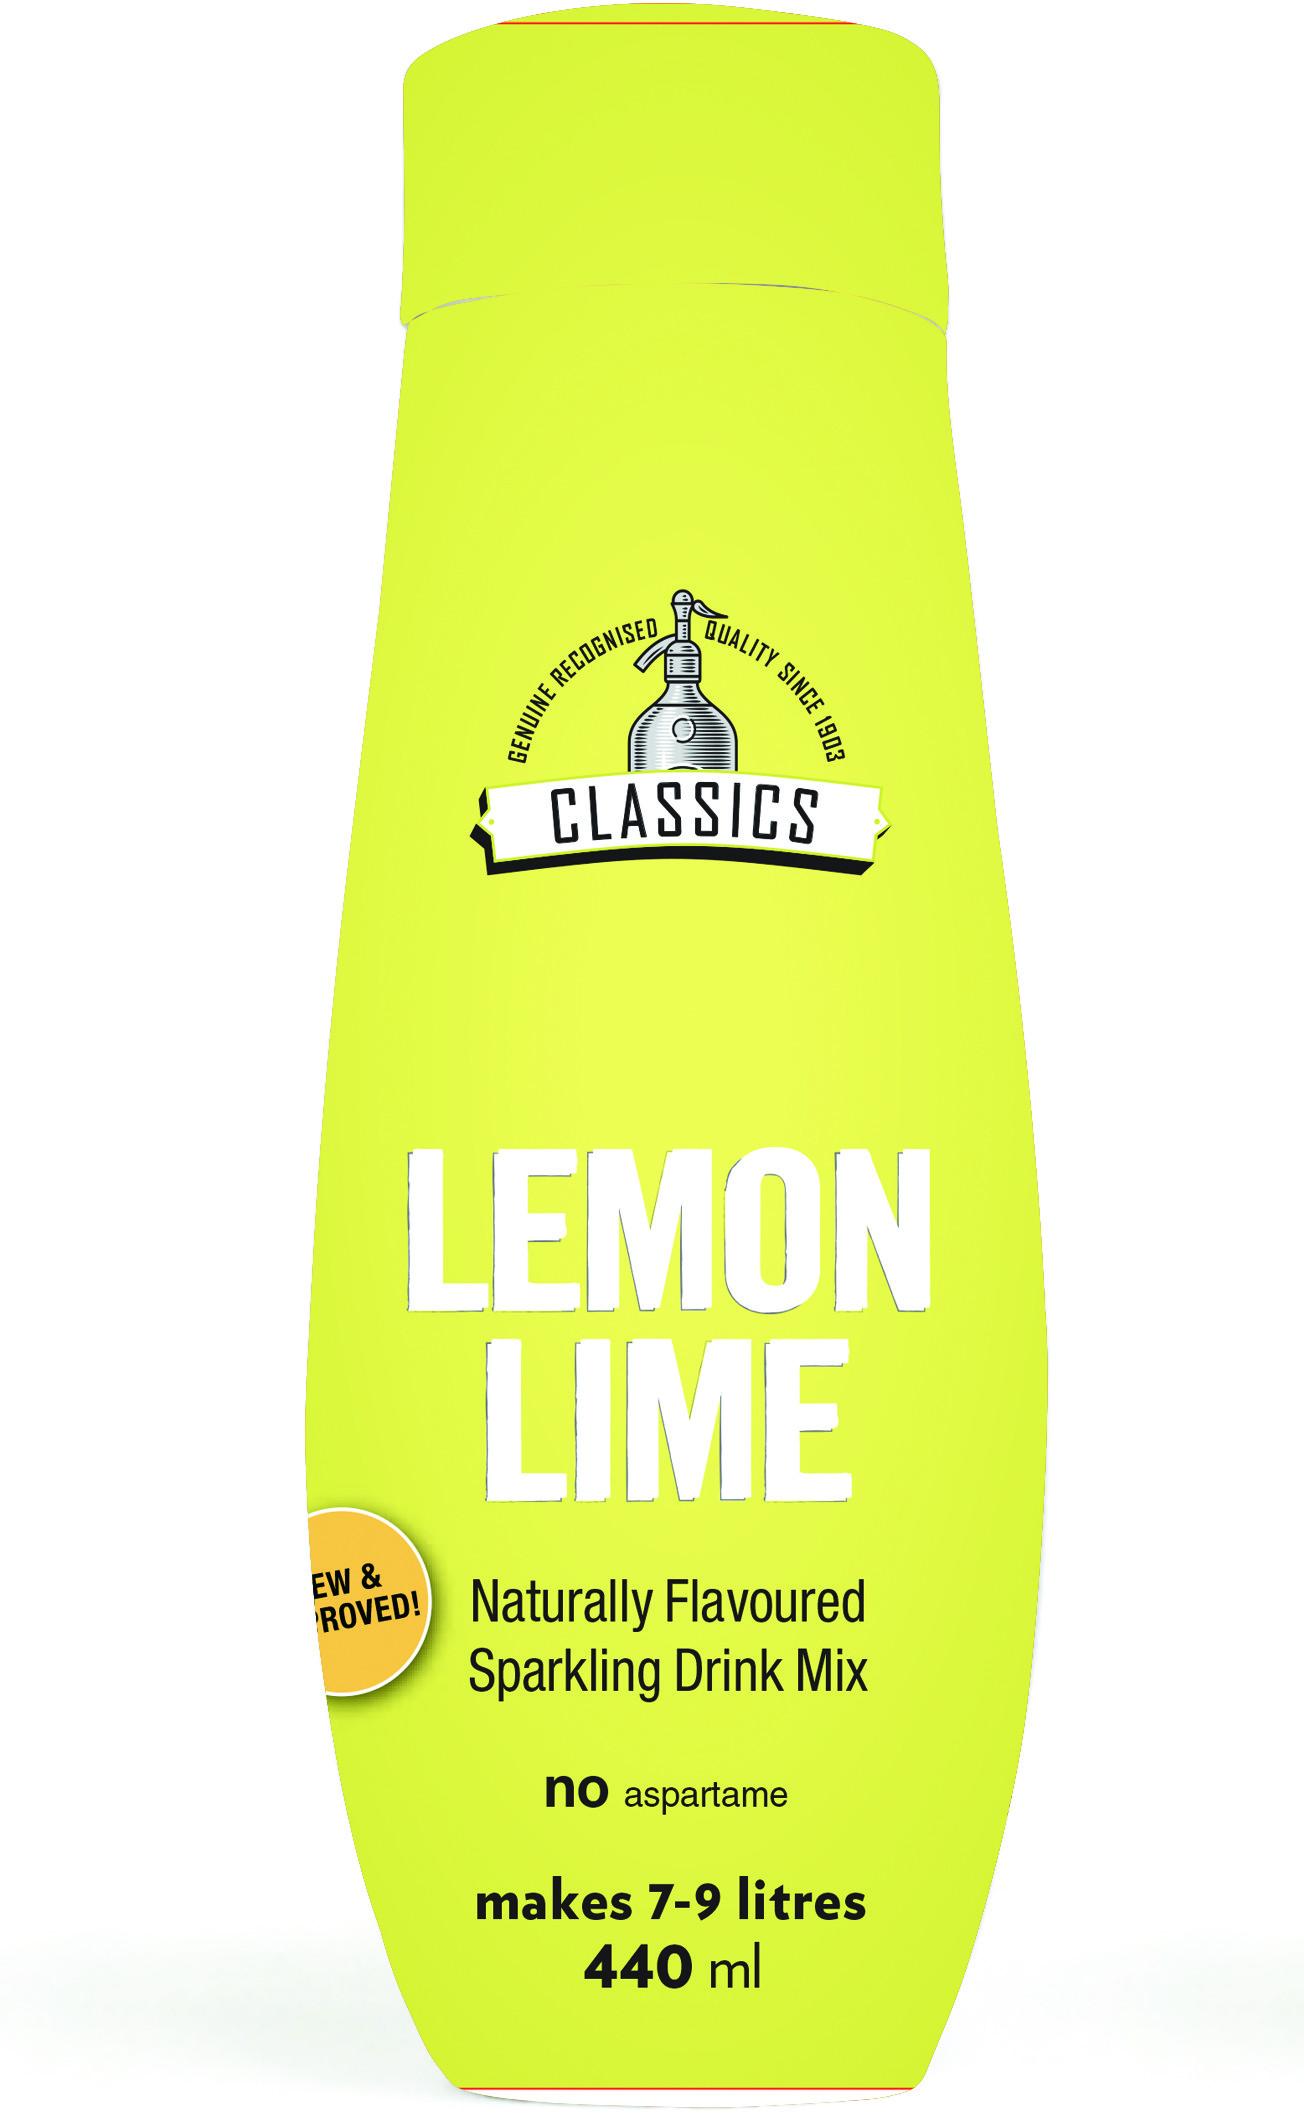 Soda Stream Syrop Lemon Lime 440ml 4900343 4900343